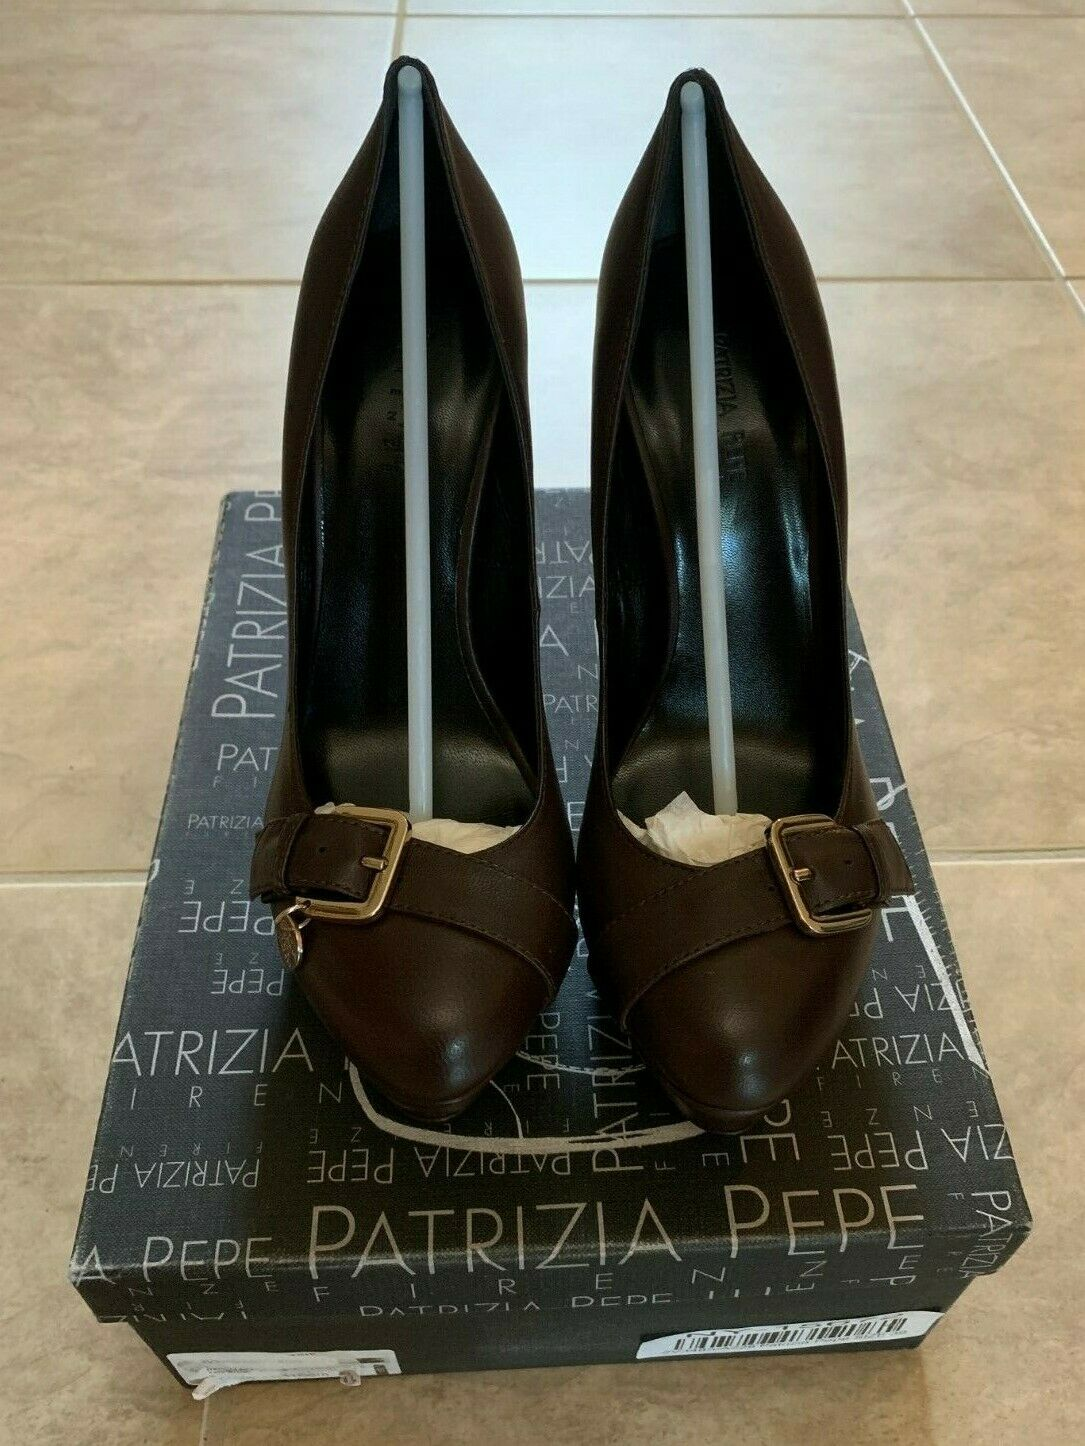 Patrizia Pepe marrón Closed Toe High Heels Brand NEW in Box EUR 39 US 9